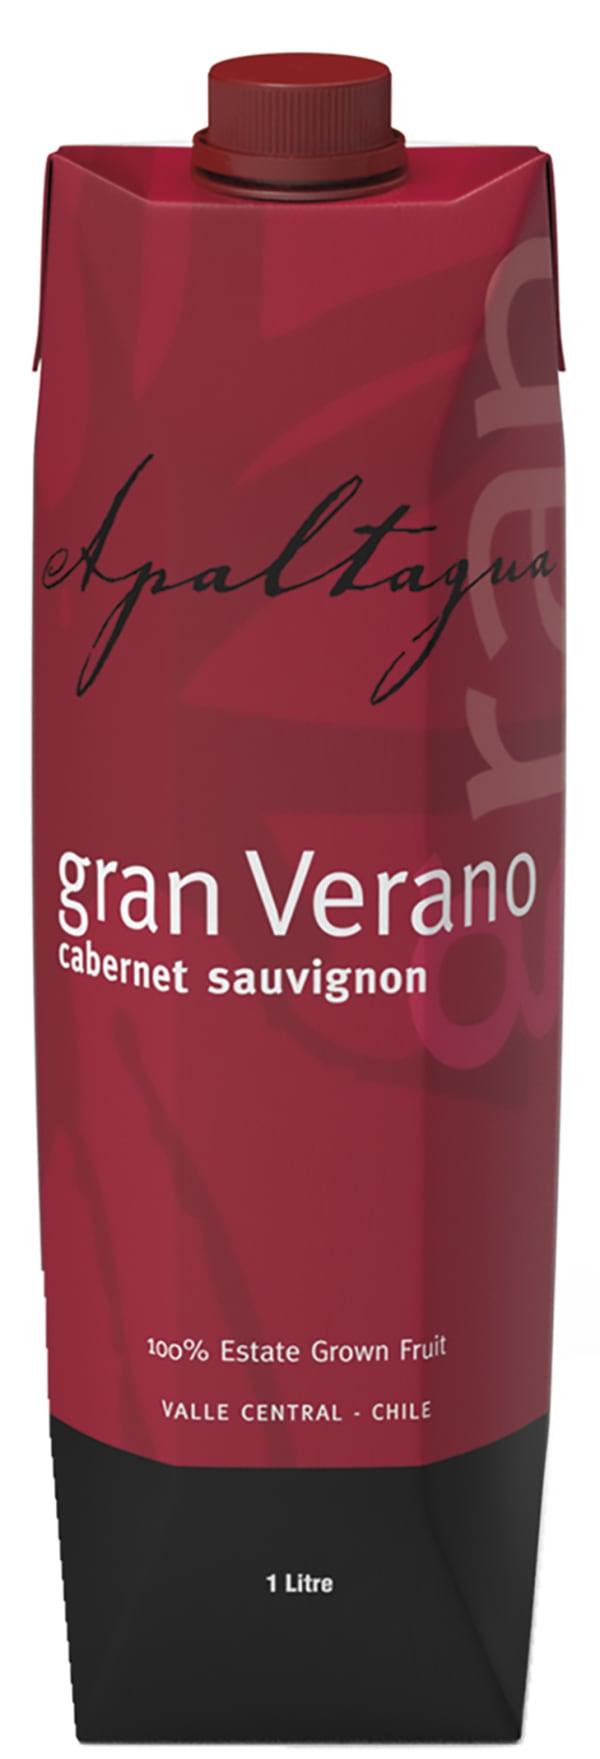 Gran Verano Cabernet Sauvignon 2015 kartongförpackning